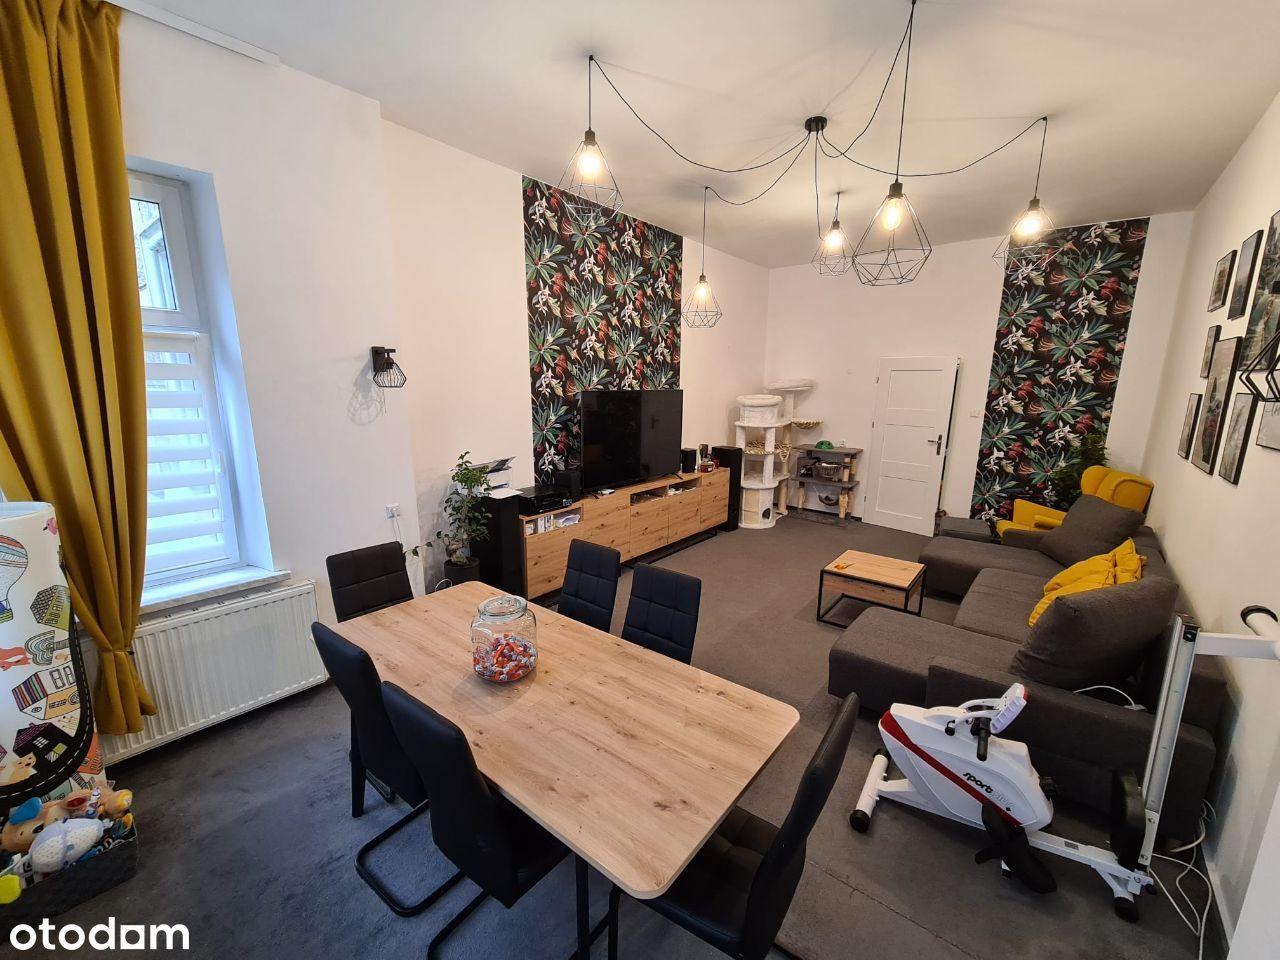 Mieszkanie 110m2 w Centrum / parter / po remoncie